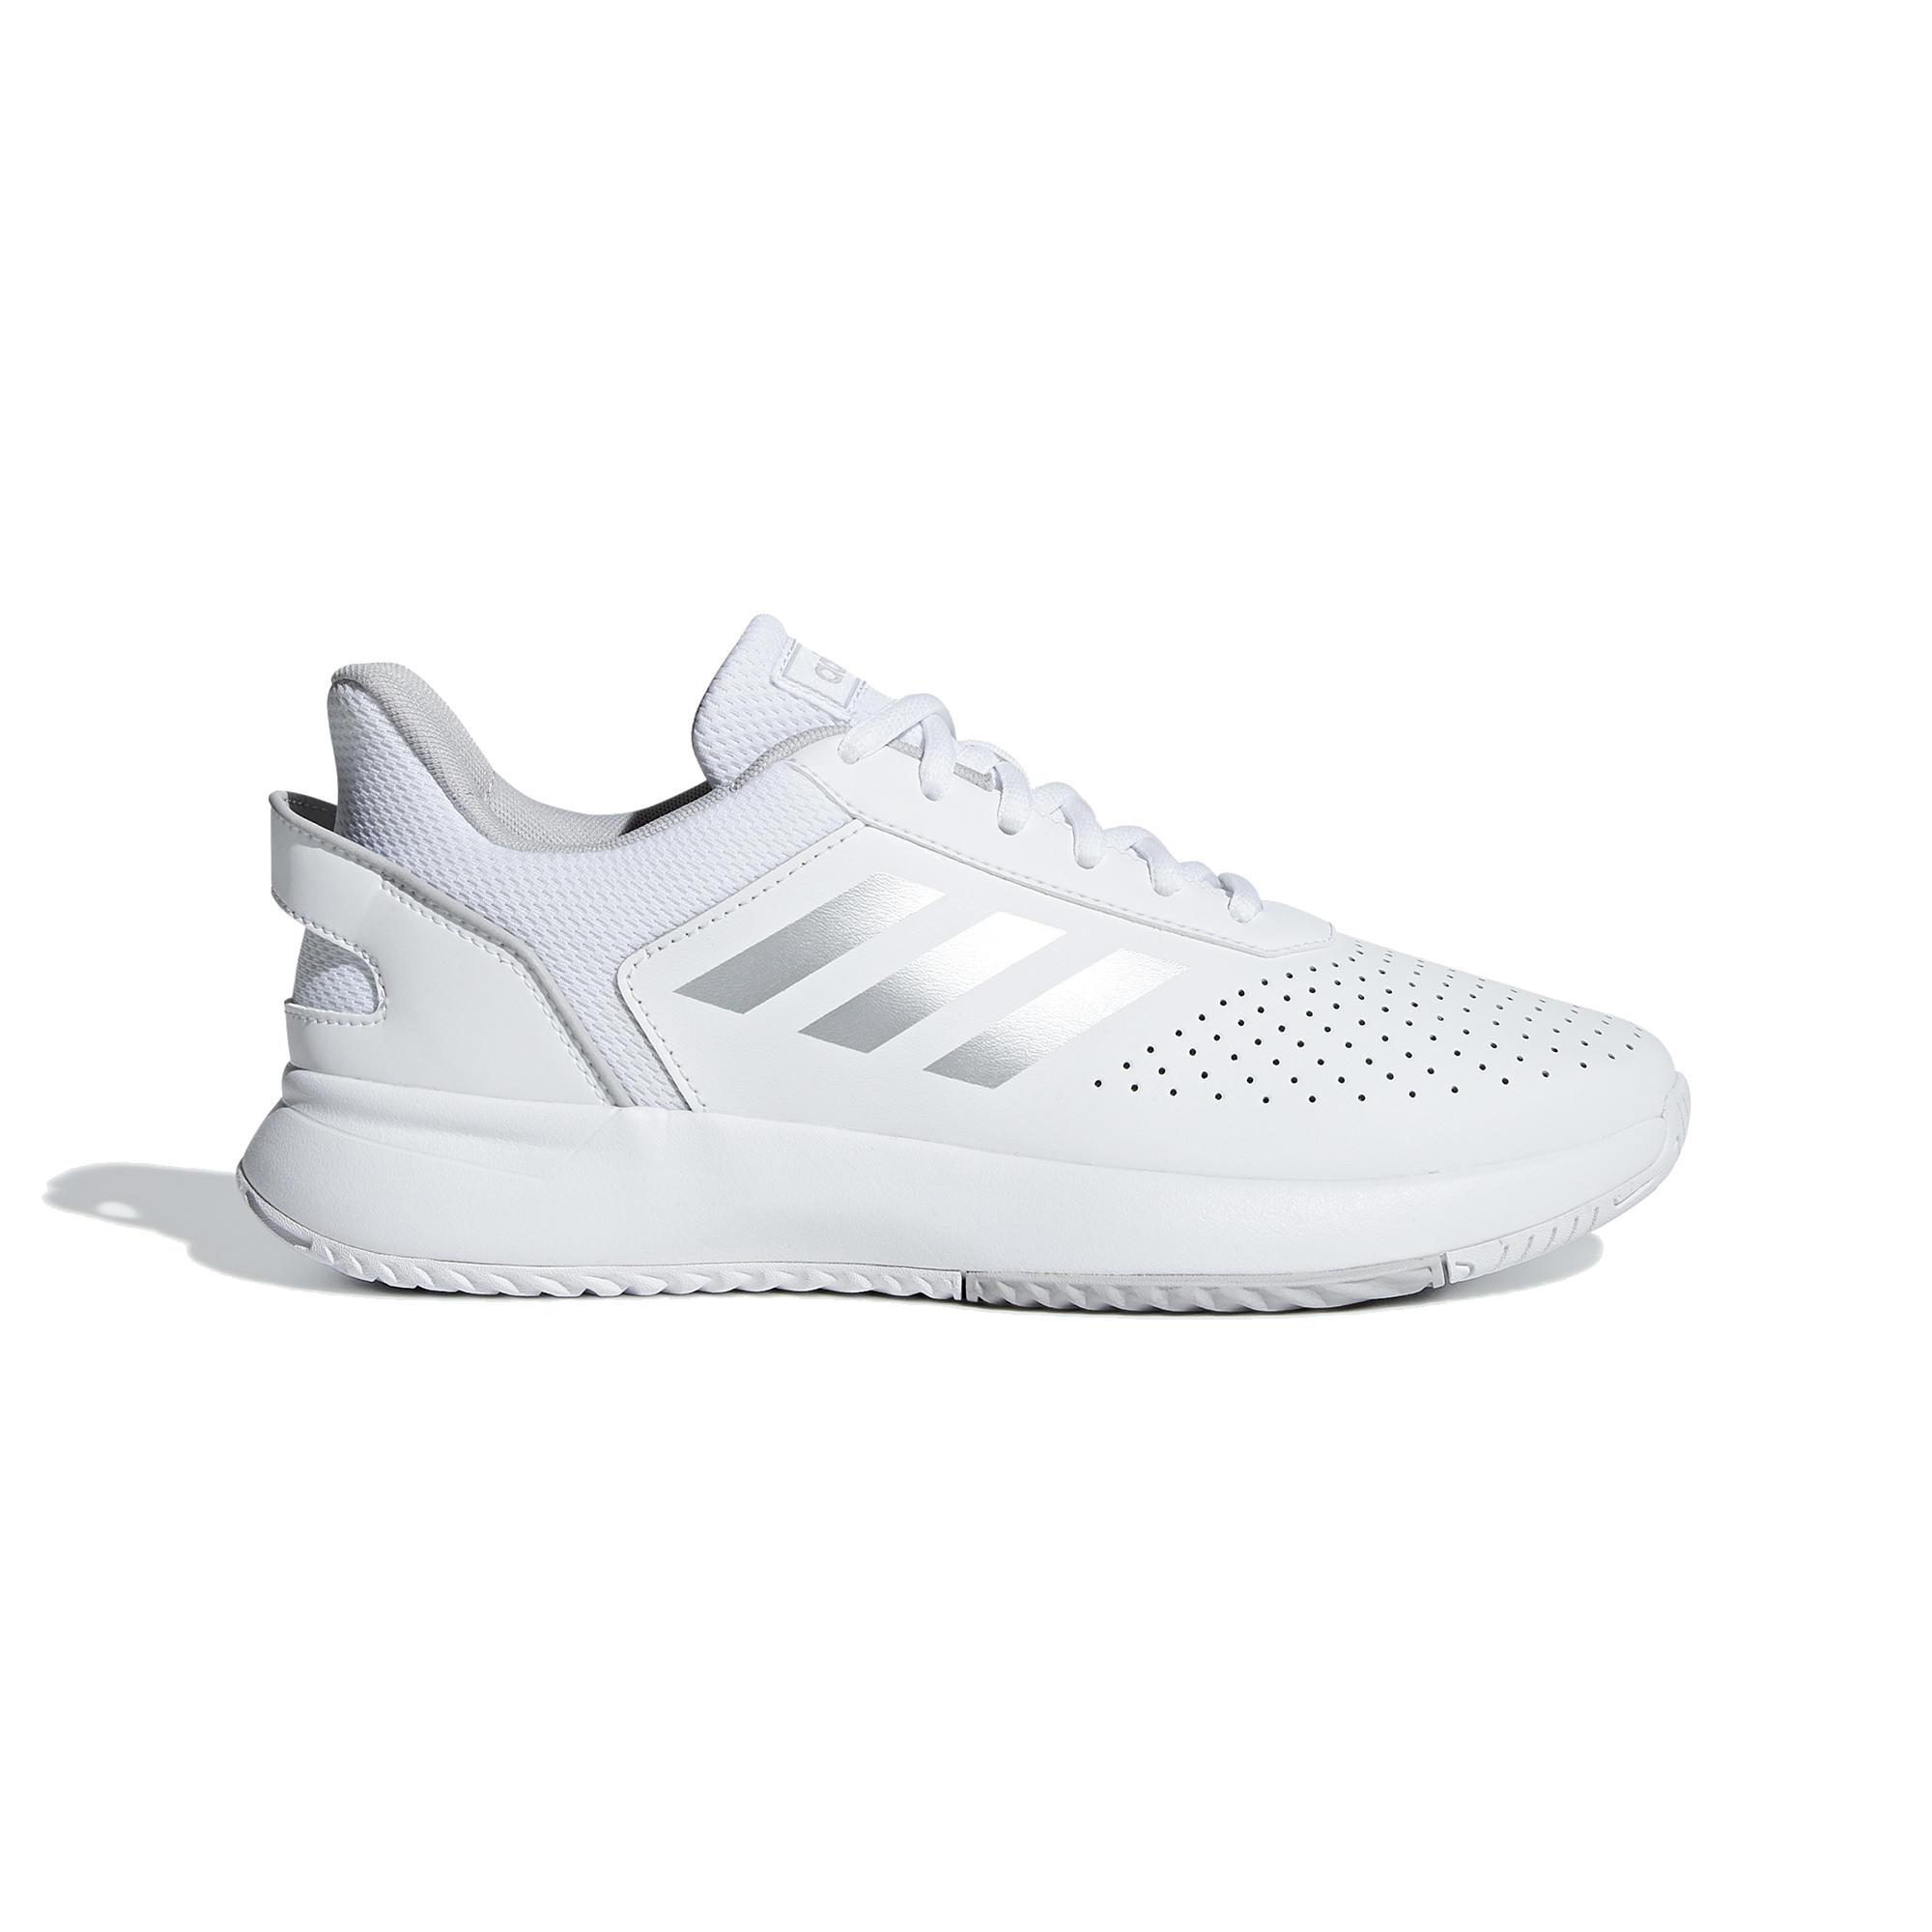 adidas ginnastica donna scarpe